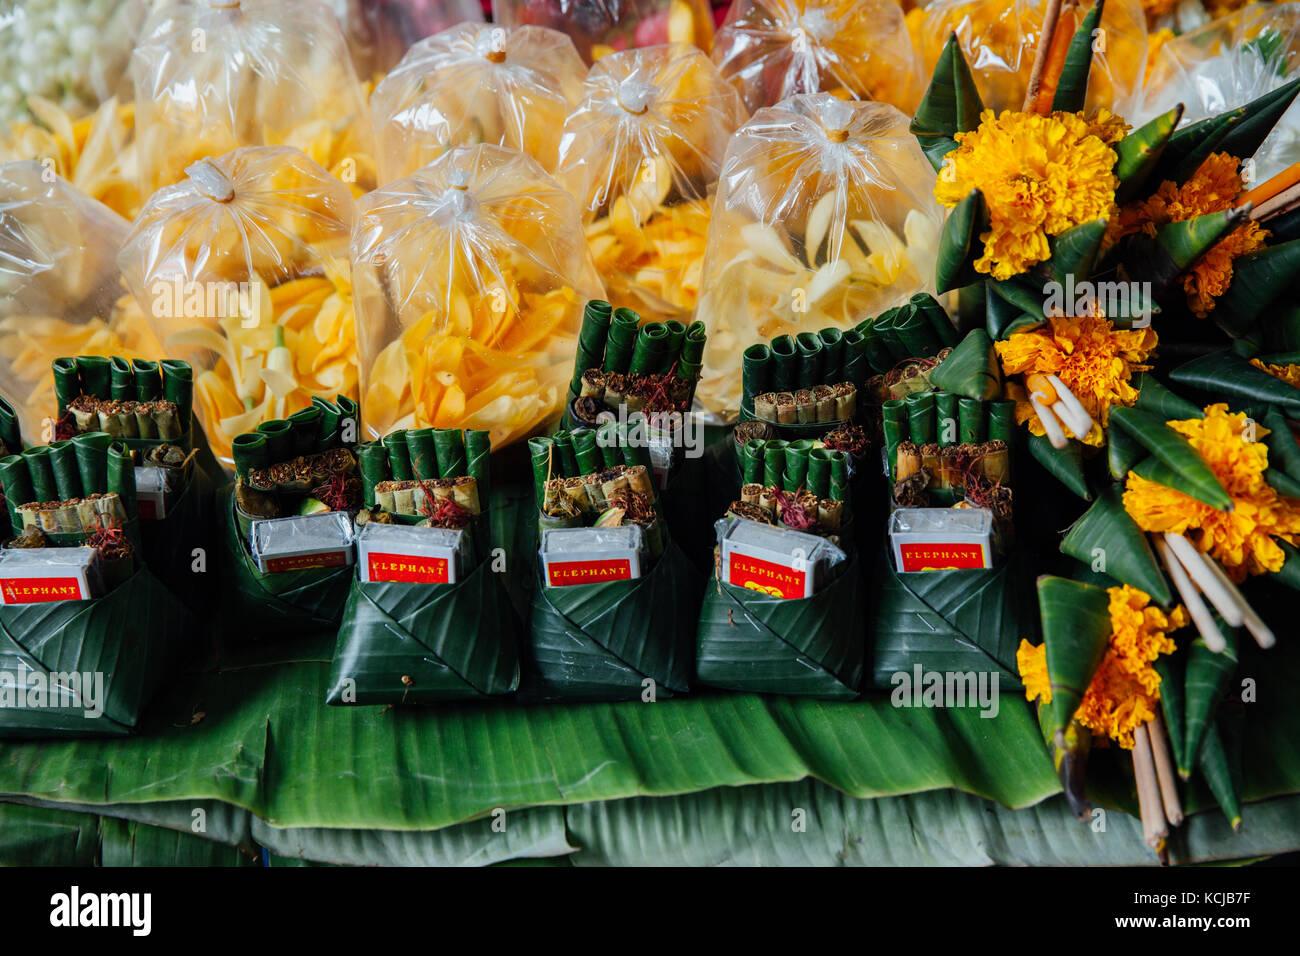 Chiang Mai, Thailand - 27. August 2016: ein Angebot stand beim Warorot Market am 27. August 2016 in Chiang Mai, Stockbild